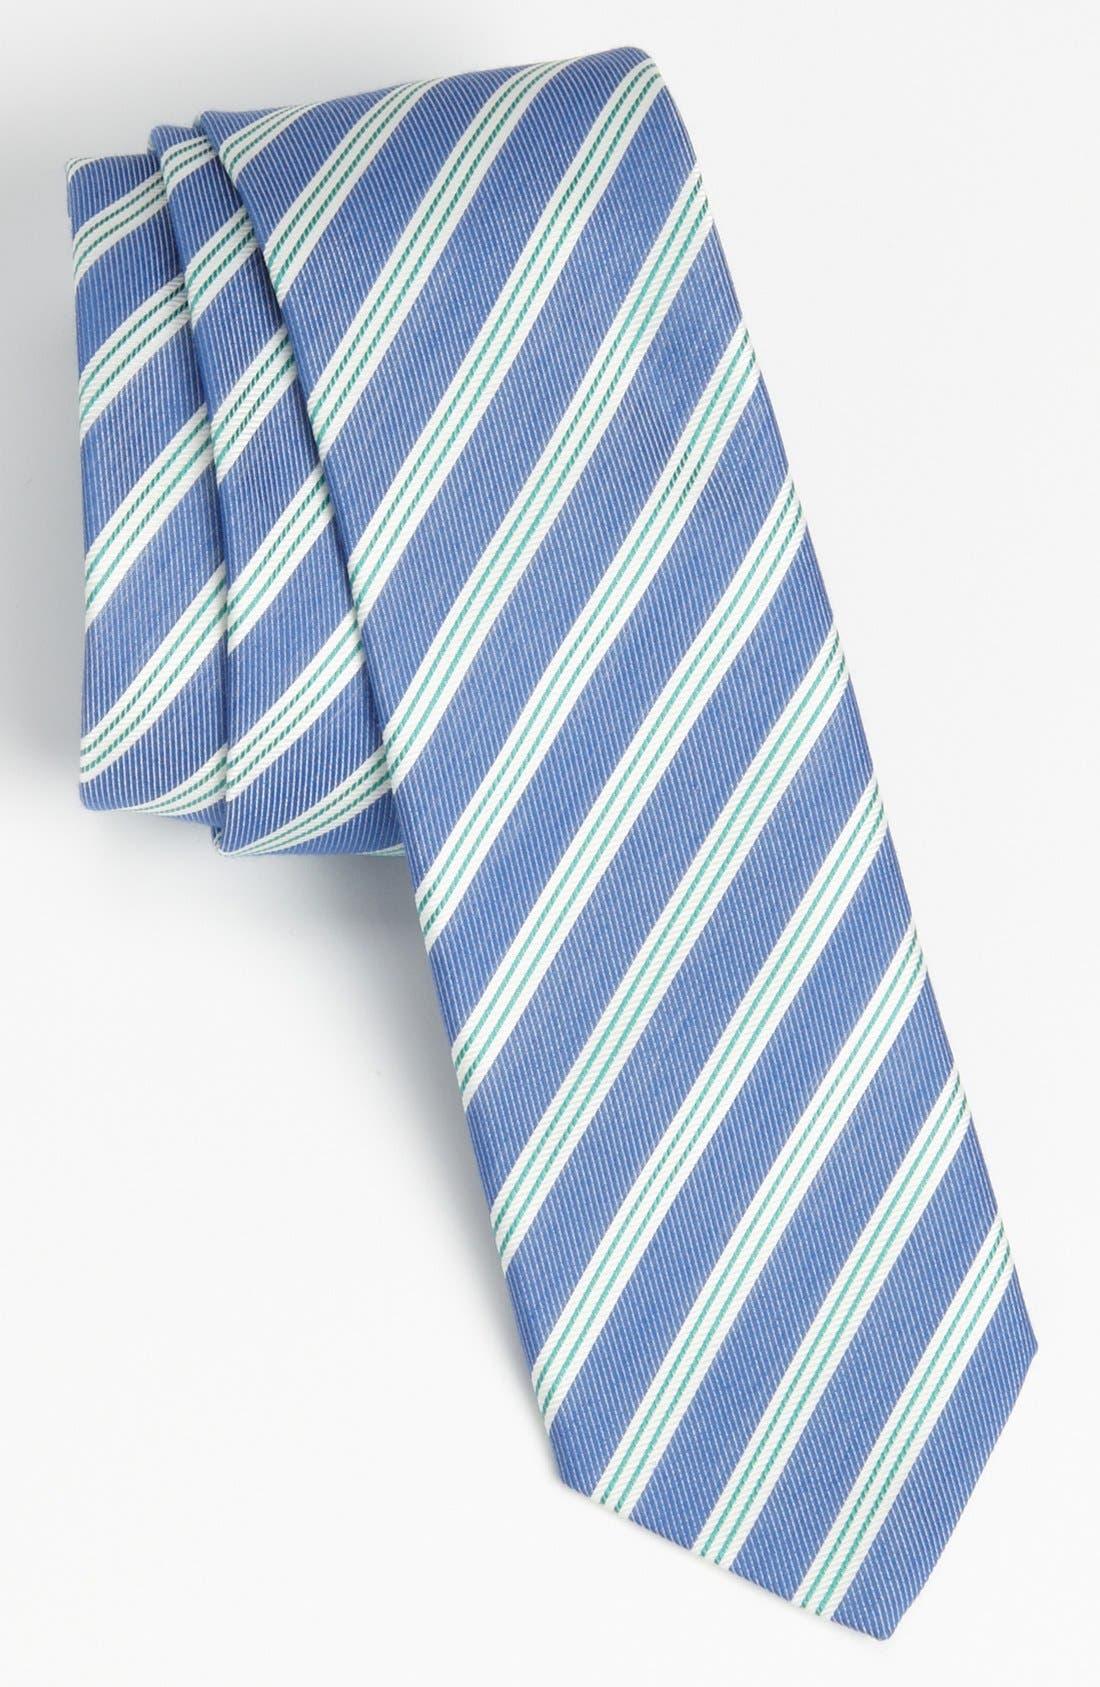 Main Image - BOSS HUGO BOSS Woven Tie